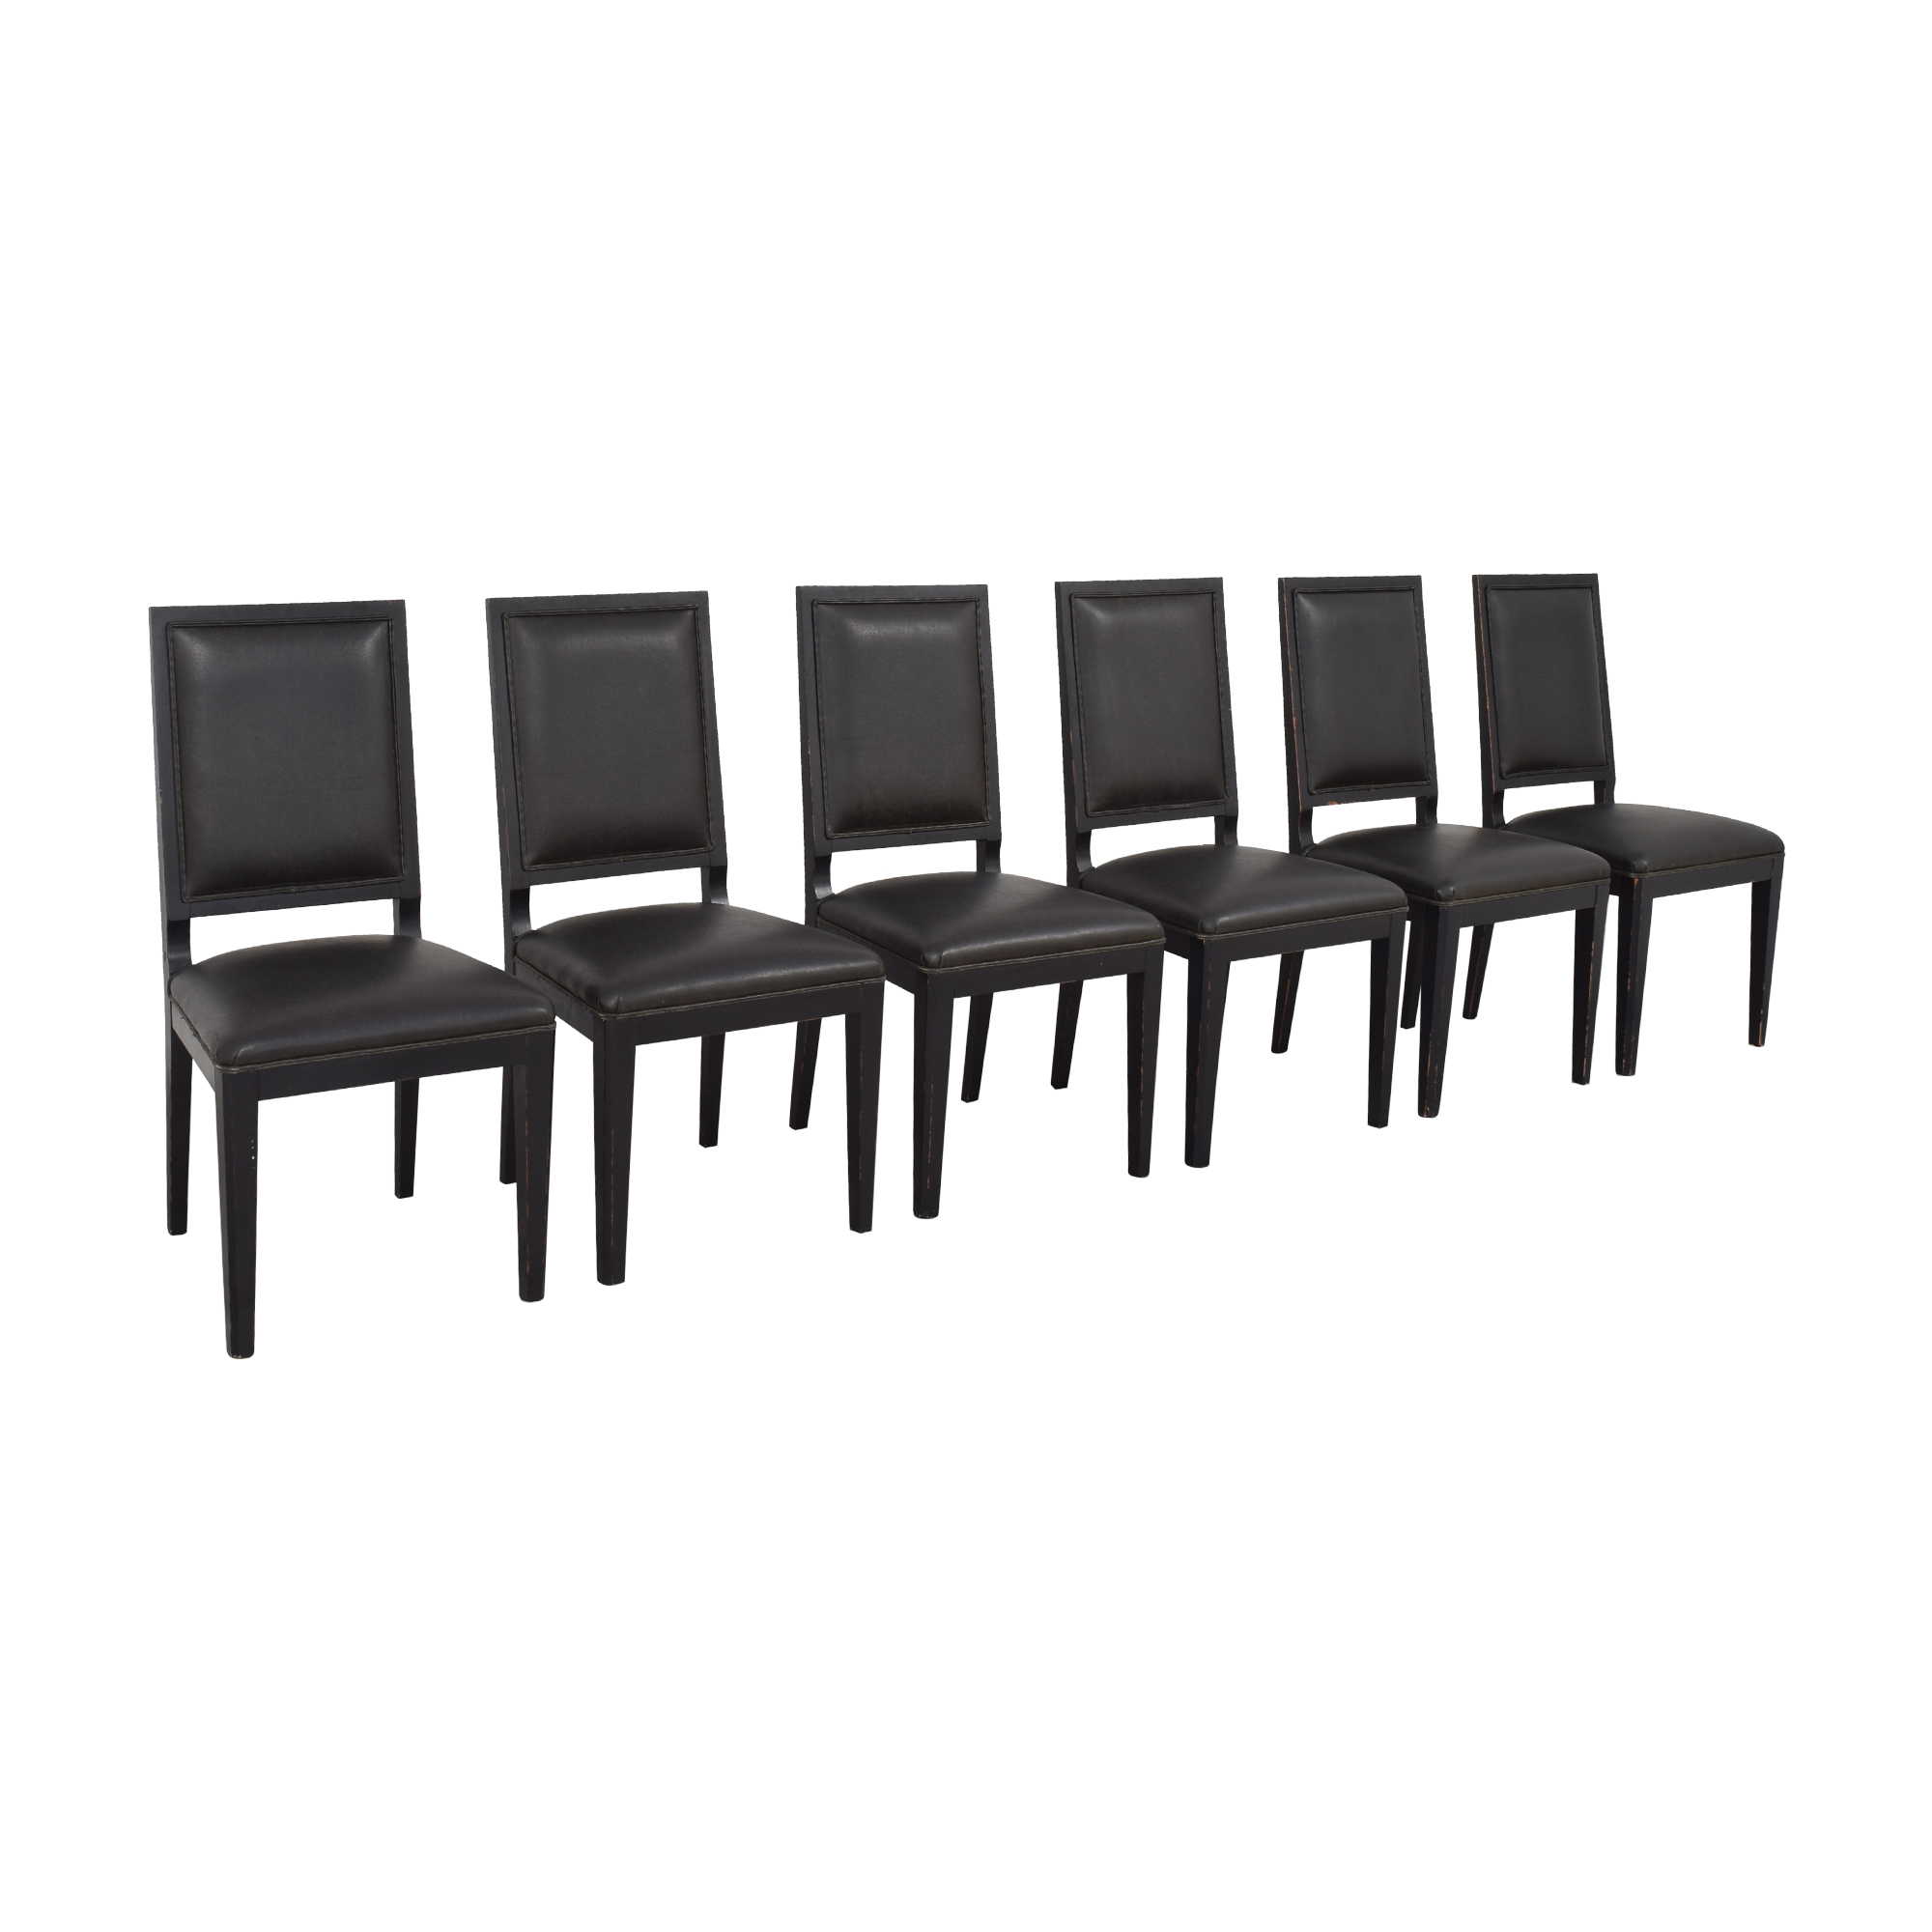 Crate & Barrel Sonata Dining Chairs Crate & Barrel